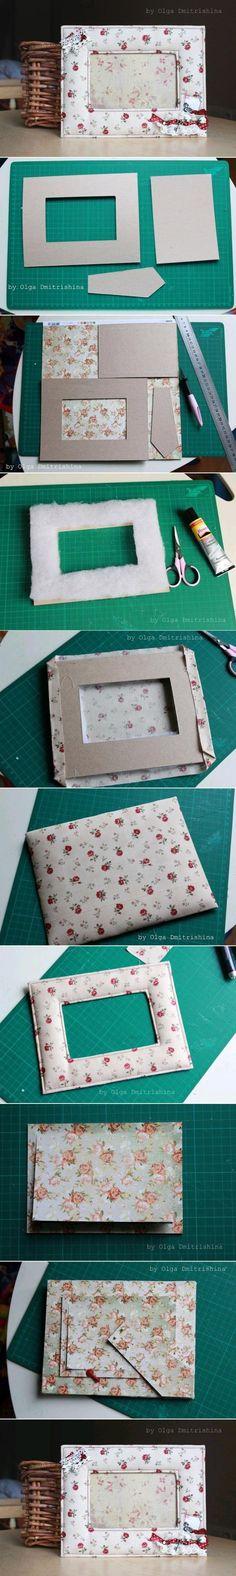 DIY Soft Picture Frame DIY Soft Picture Frame